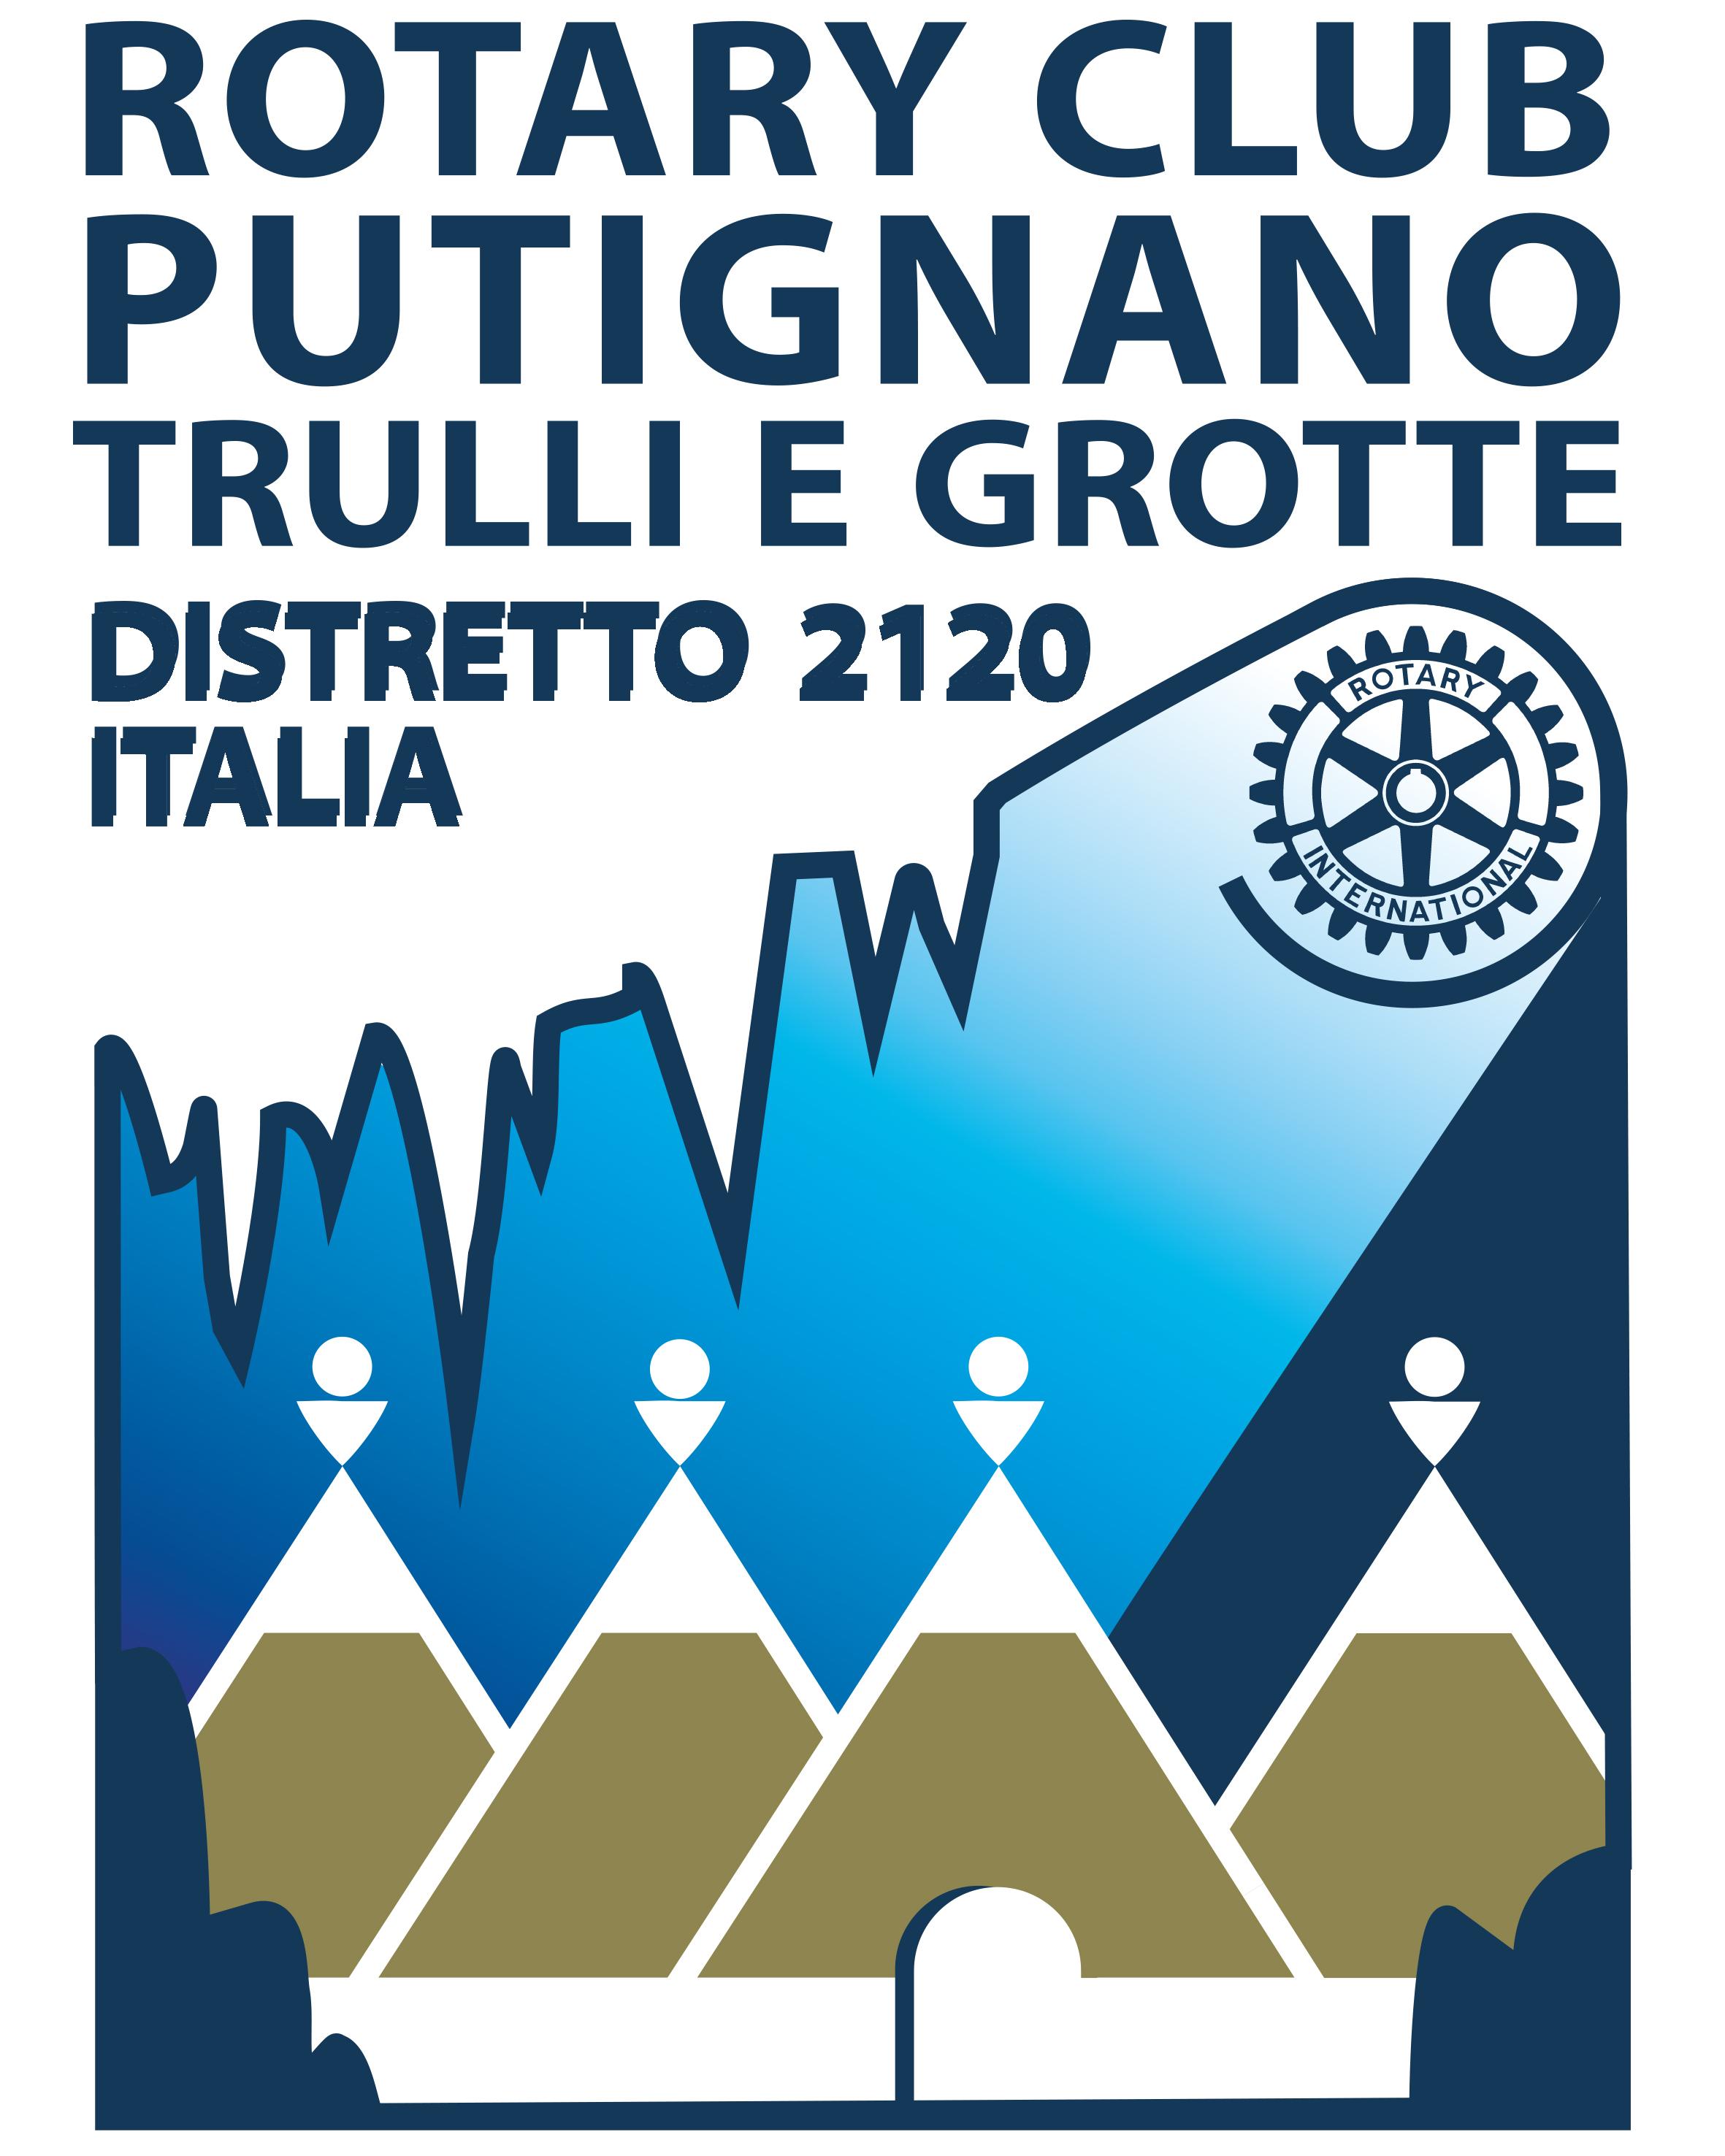 Rotary Putignano